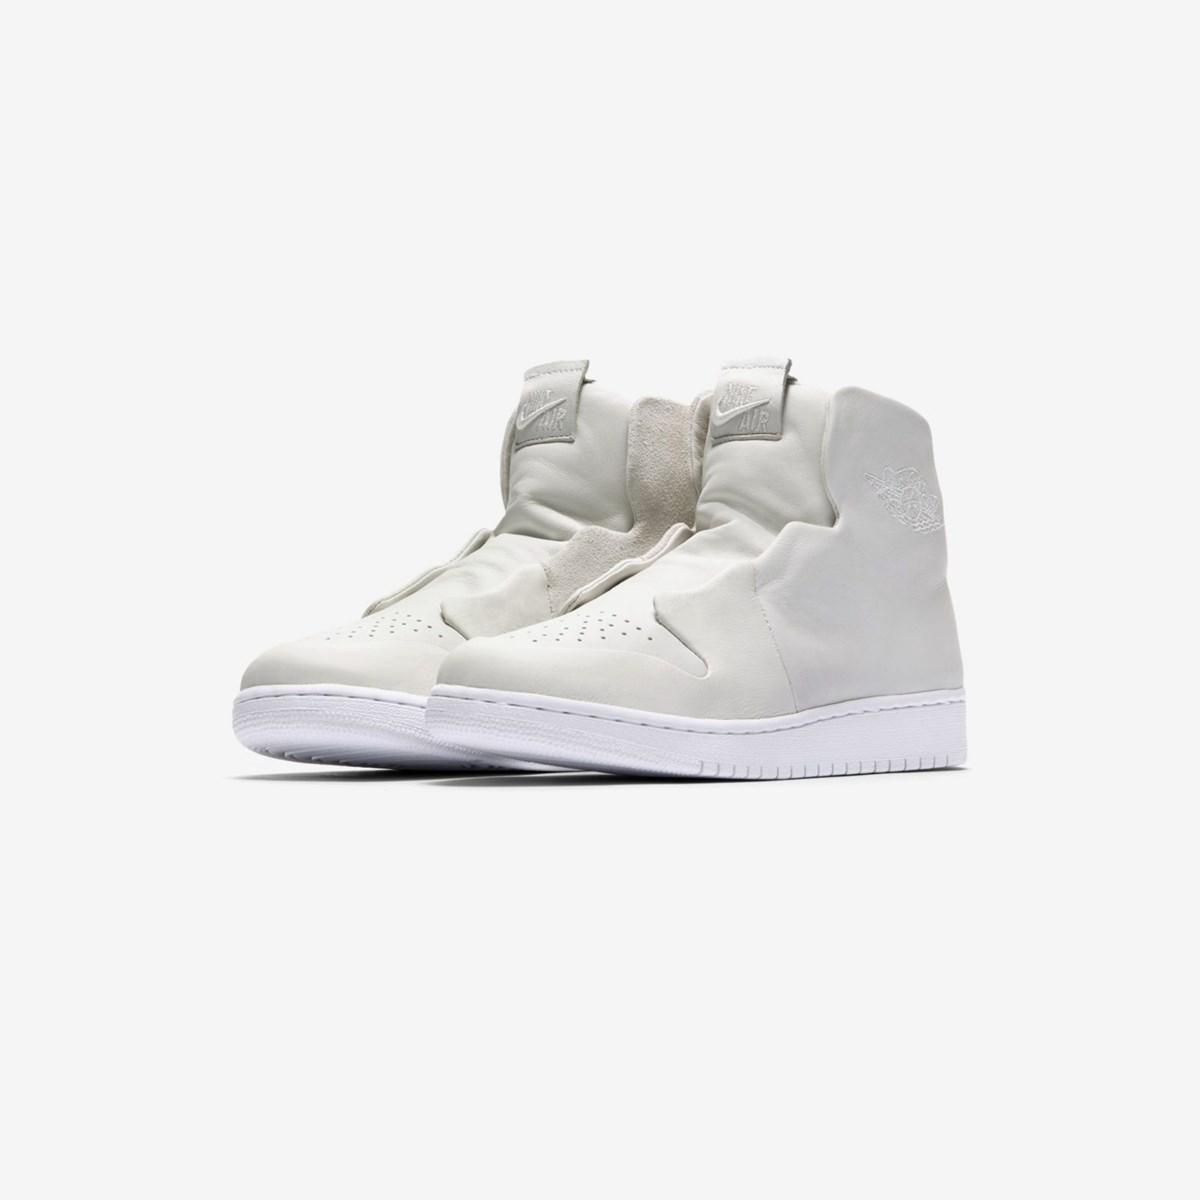 d4e731d888061a Jordan Brand Air Jordan 1 Sage XX THE 1